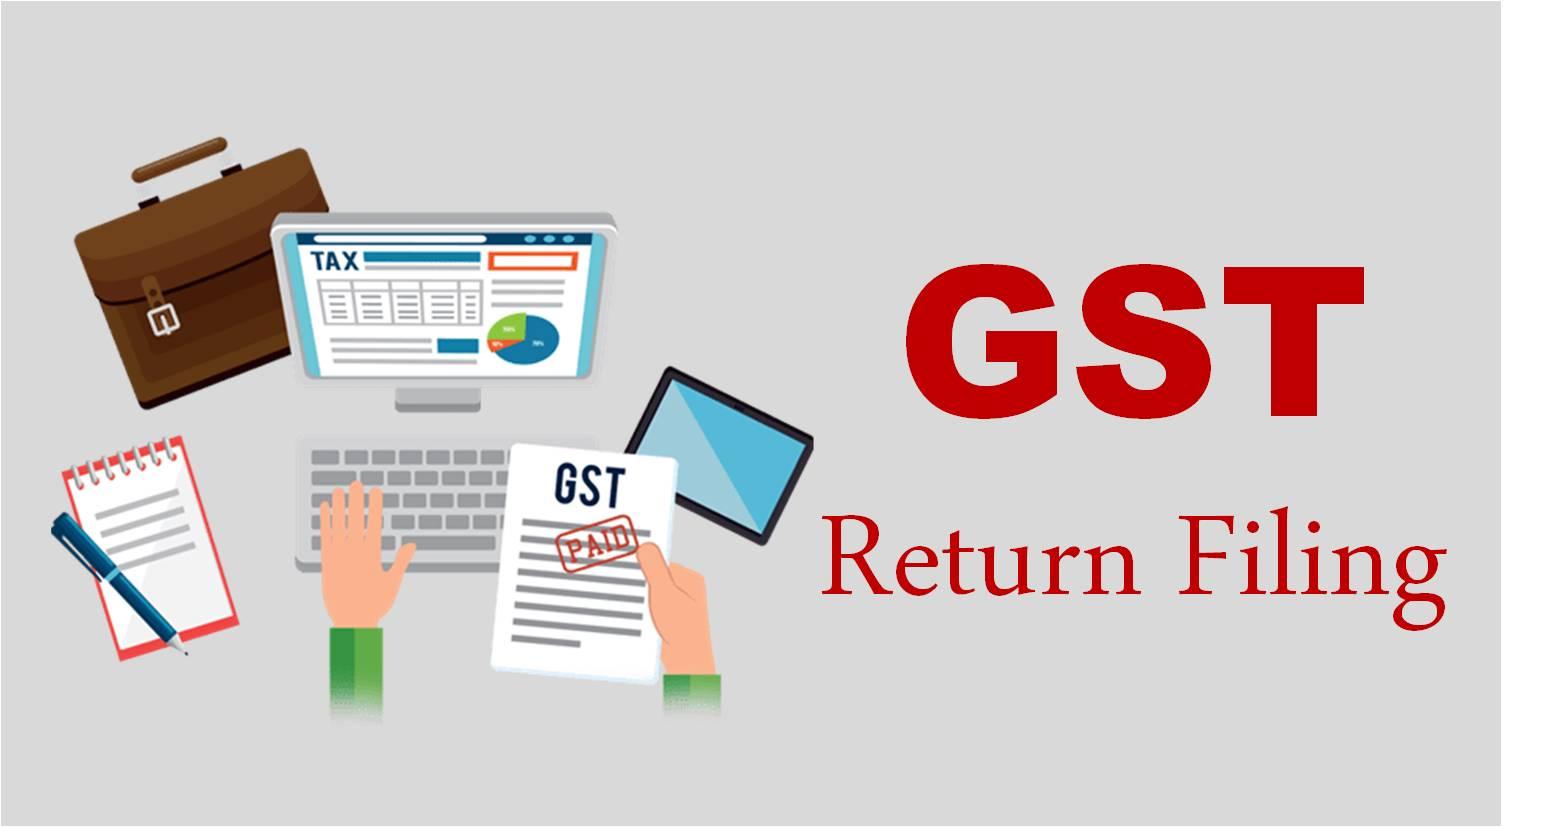 GST Return filing services in Mumbai, Maharashtra